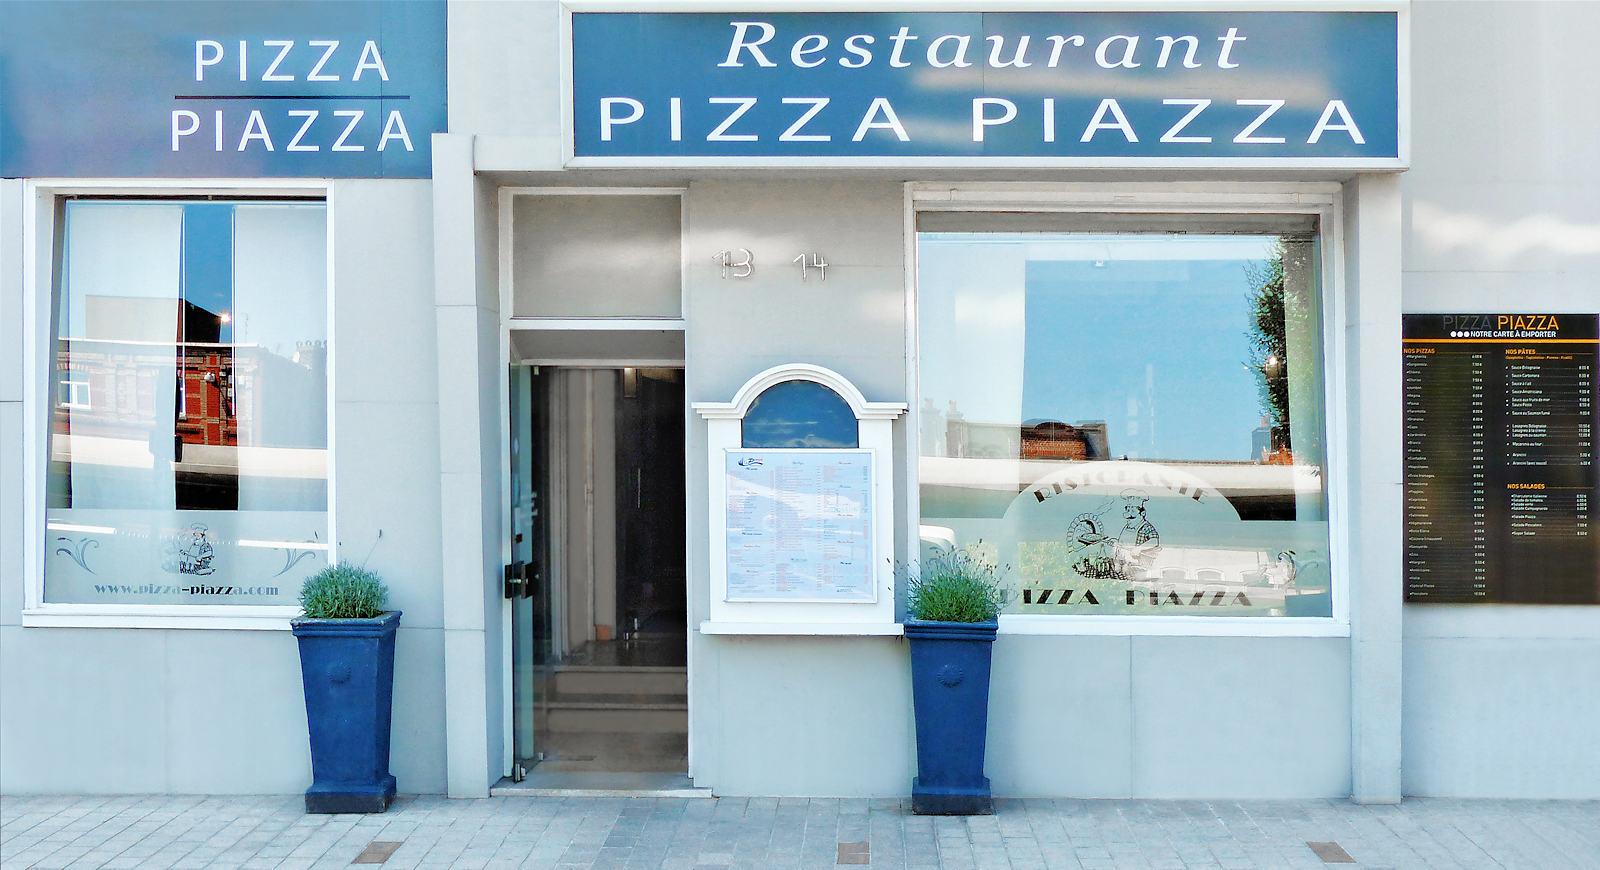 Pizza Piazza Tourcoing - Restaurant italien et pizzeria